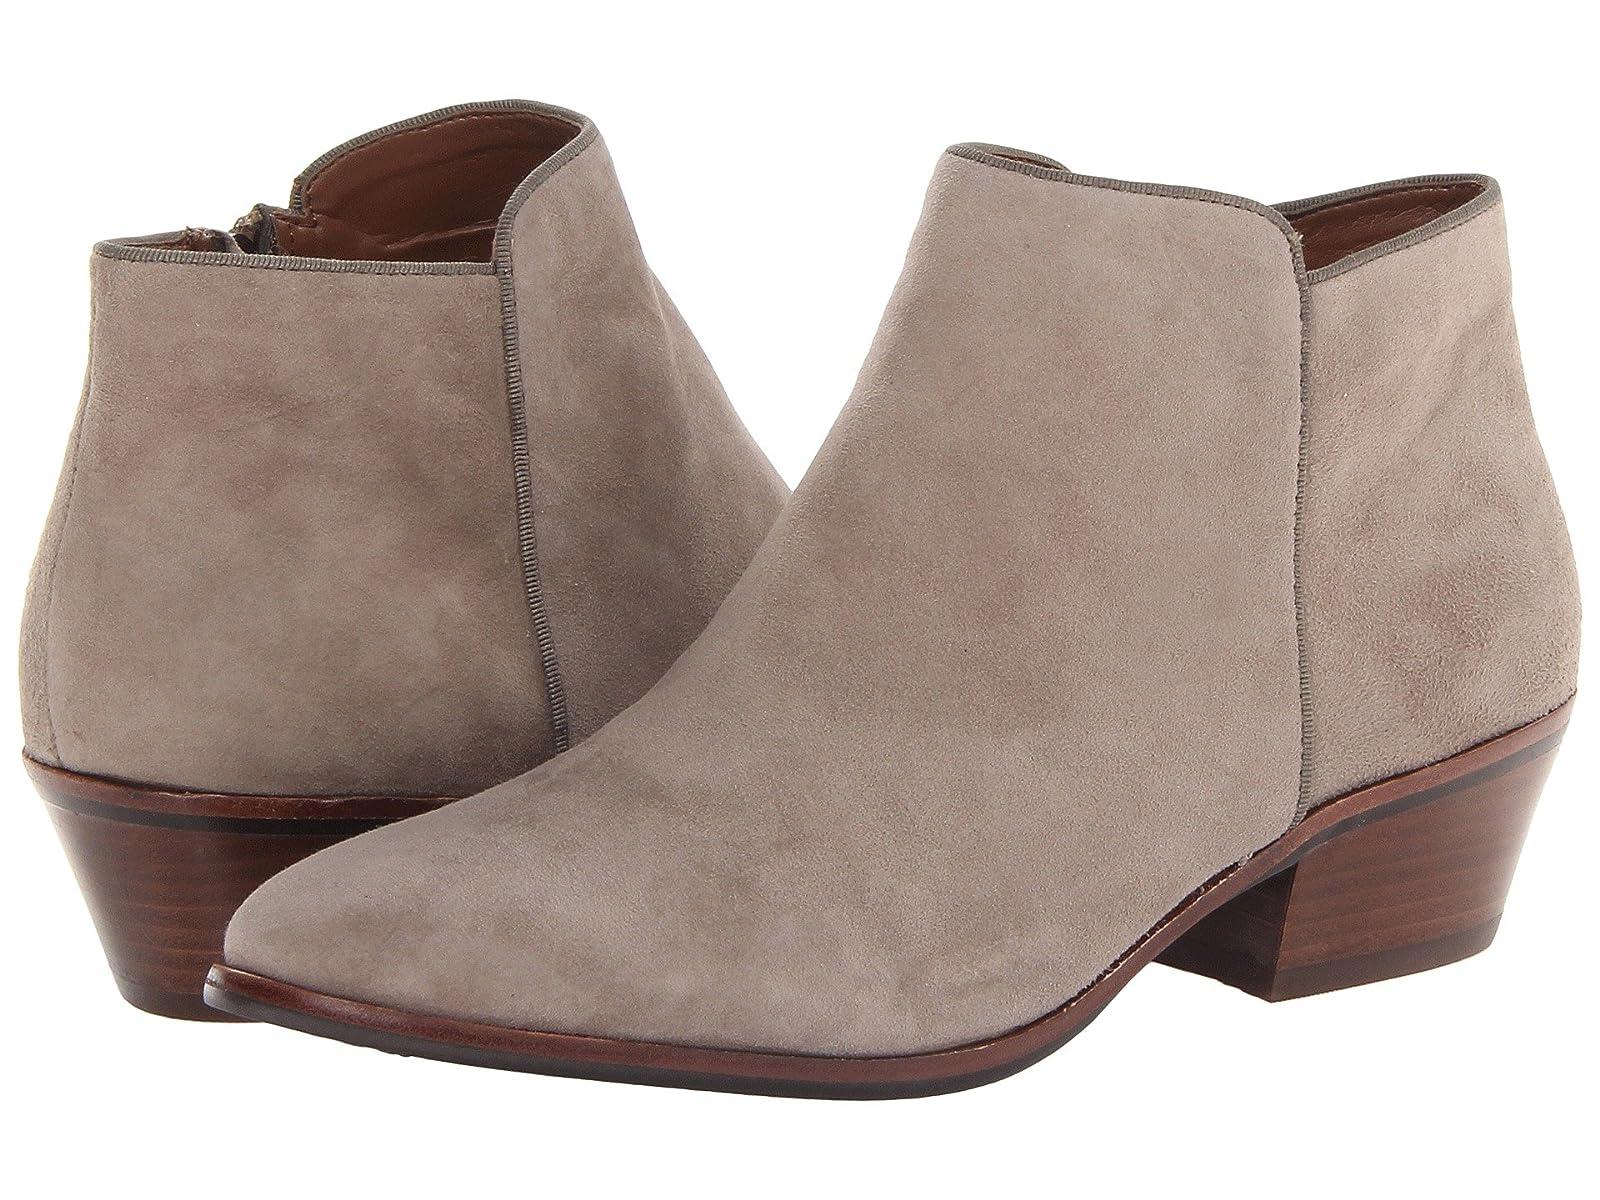 Sam Edelman PettyEconomical and quality shoes